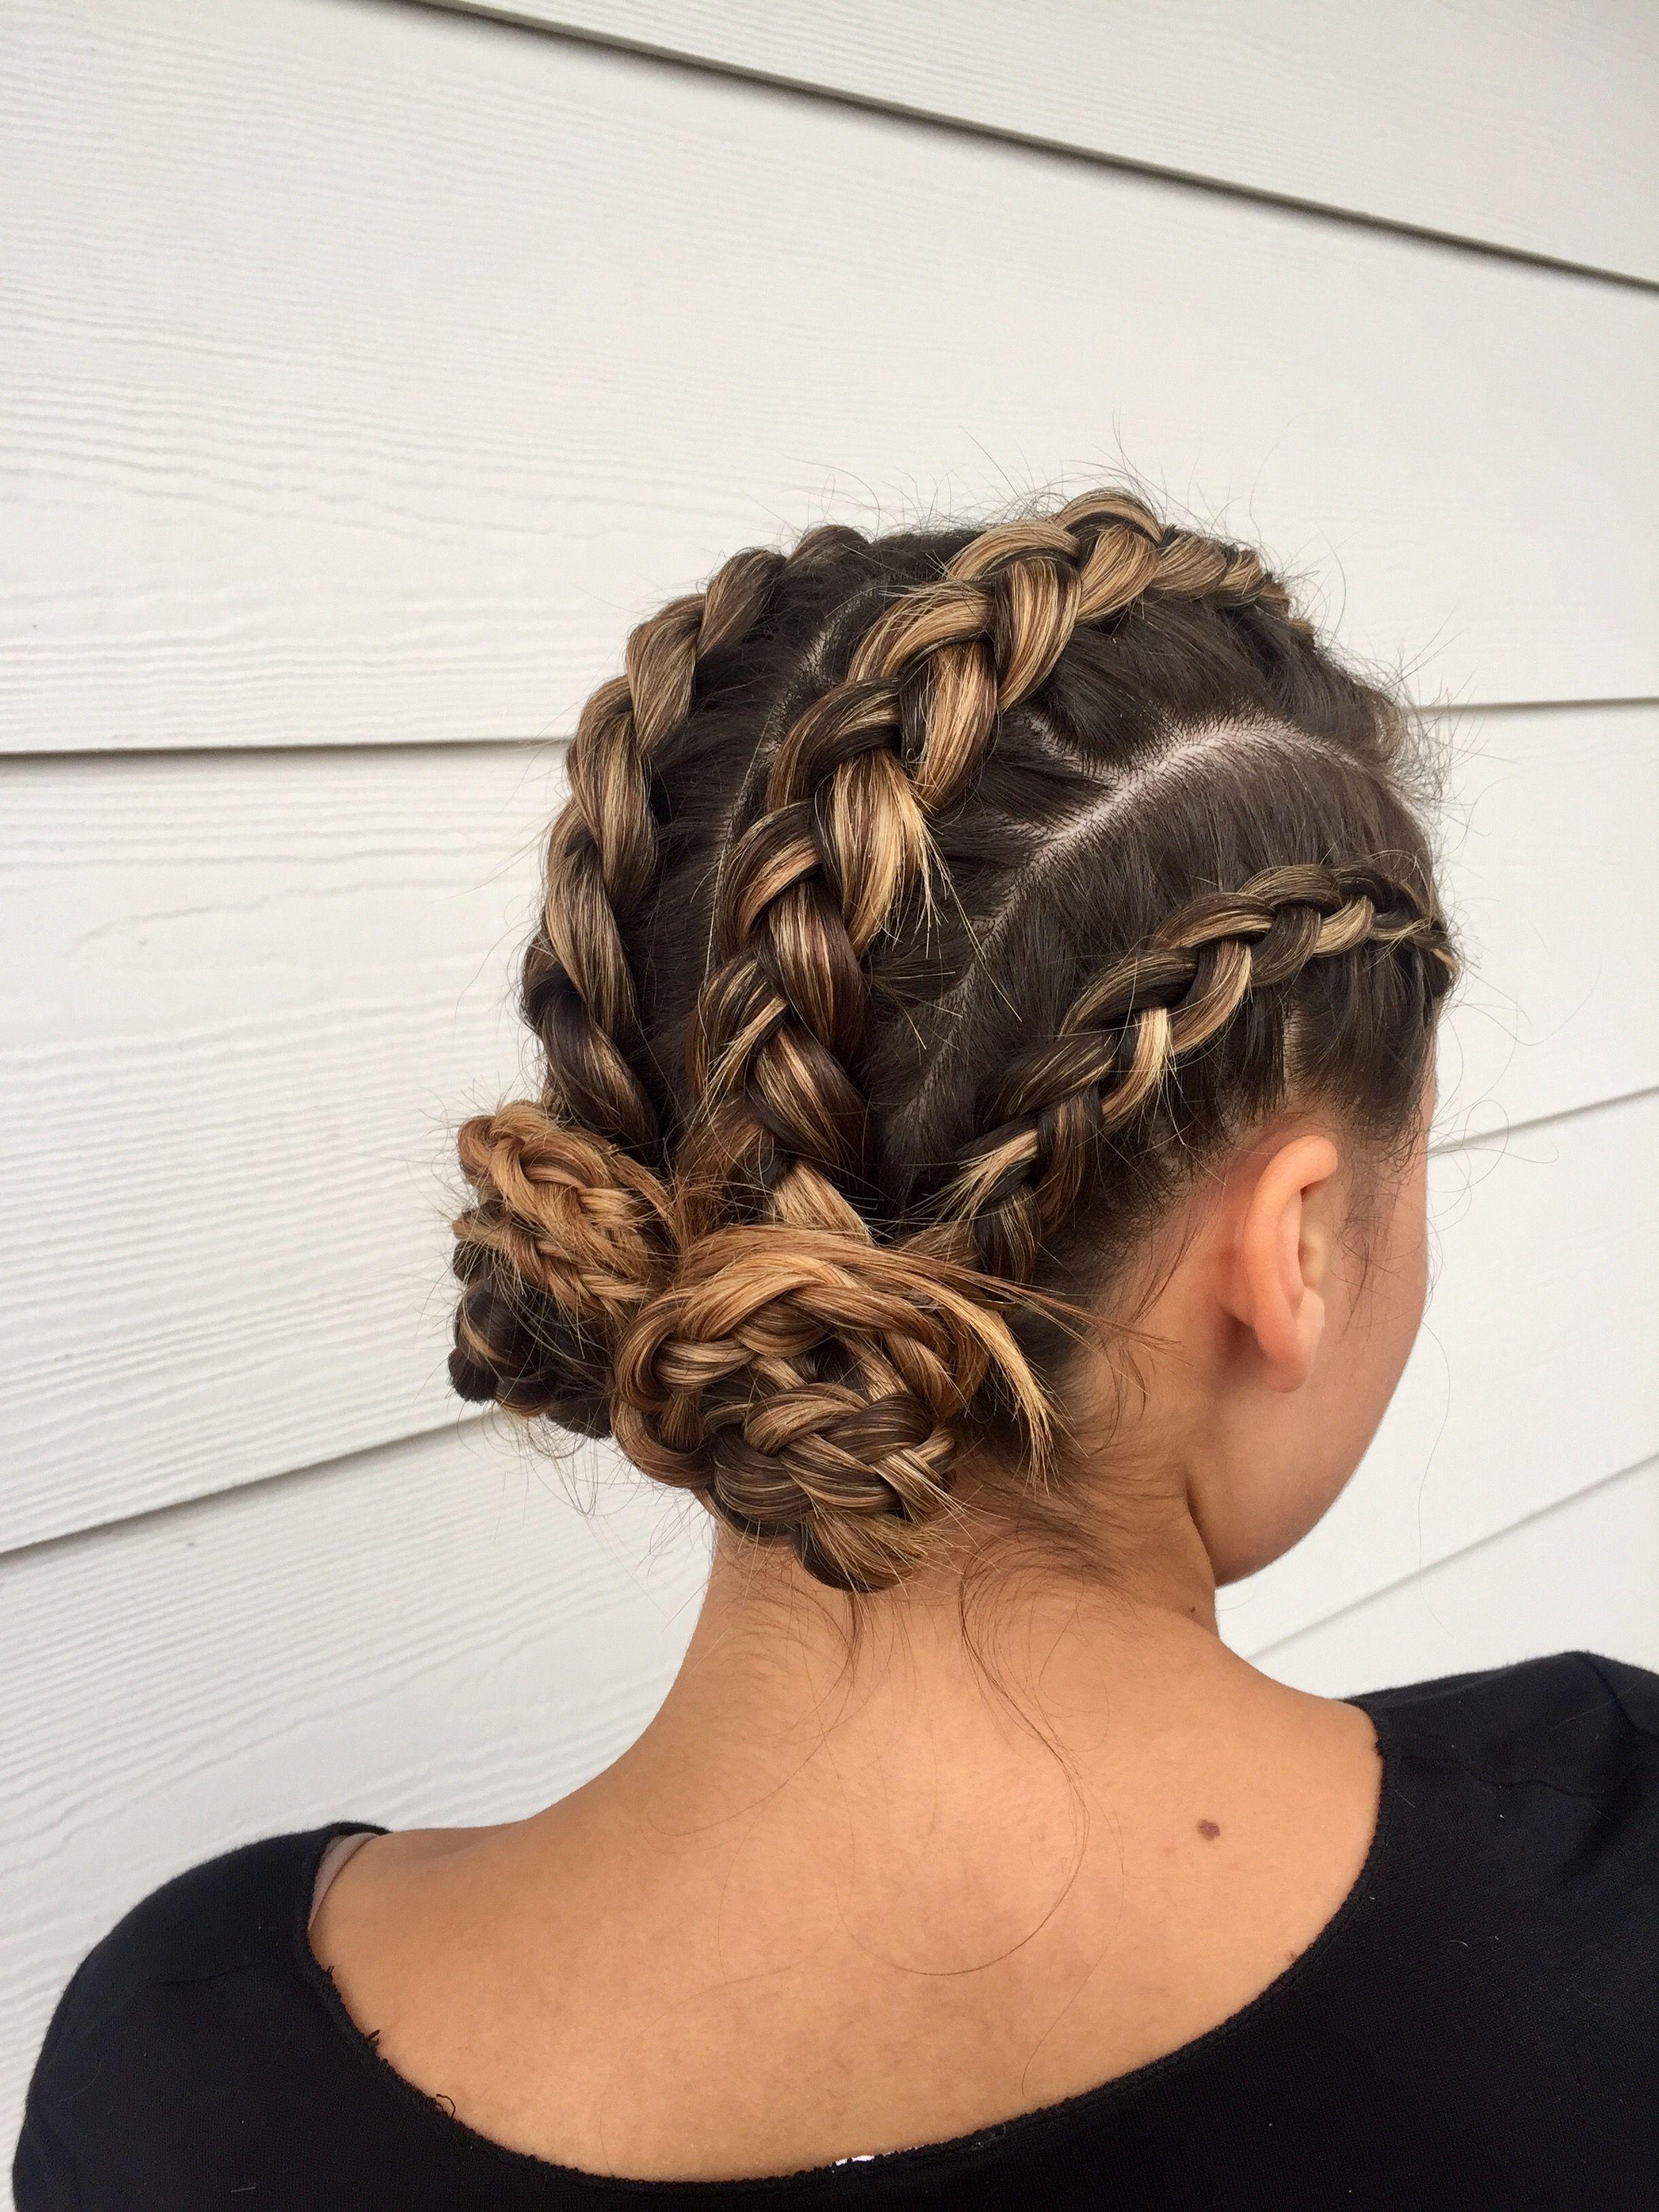 braids #cornrows #hairartistry #hairstyle #buns  Braided